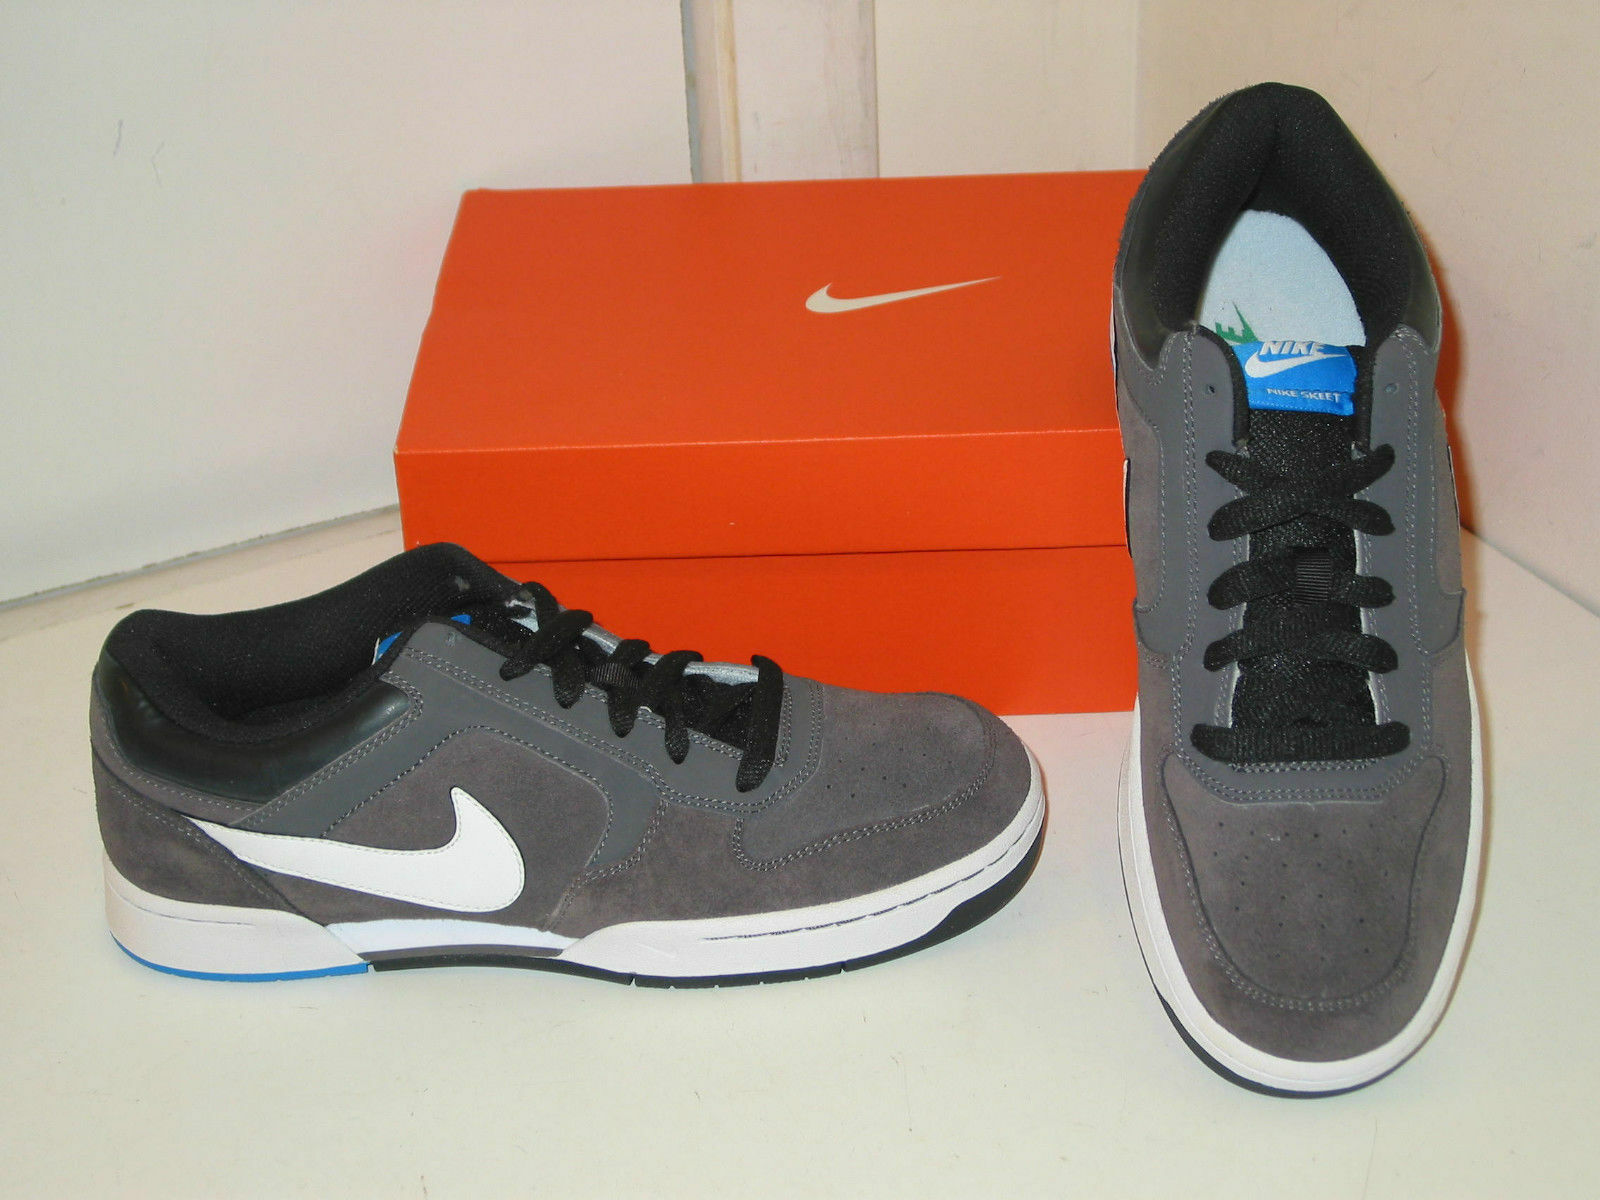 Nike skeet merletto bianco e grigio scarpe camoscio atletico casual scarpe scarpe grigio Uomo 8,5 fe5d13